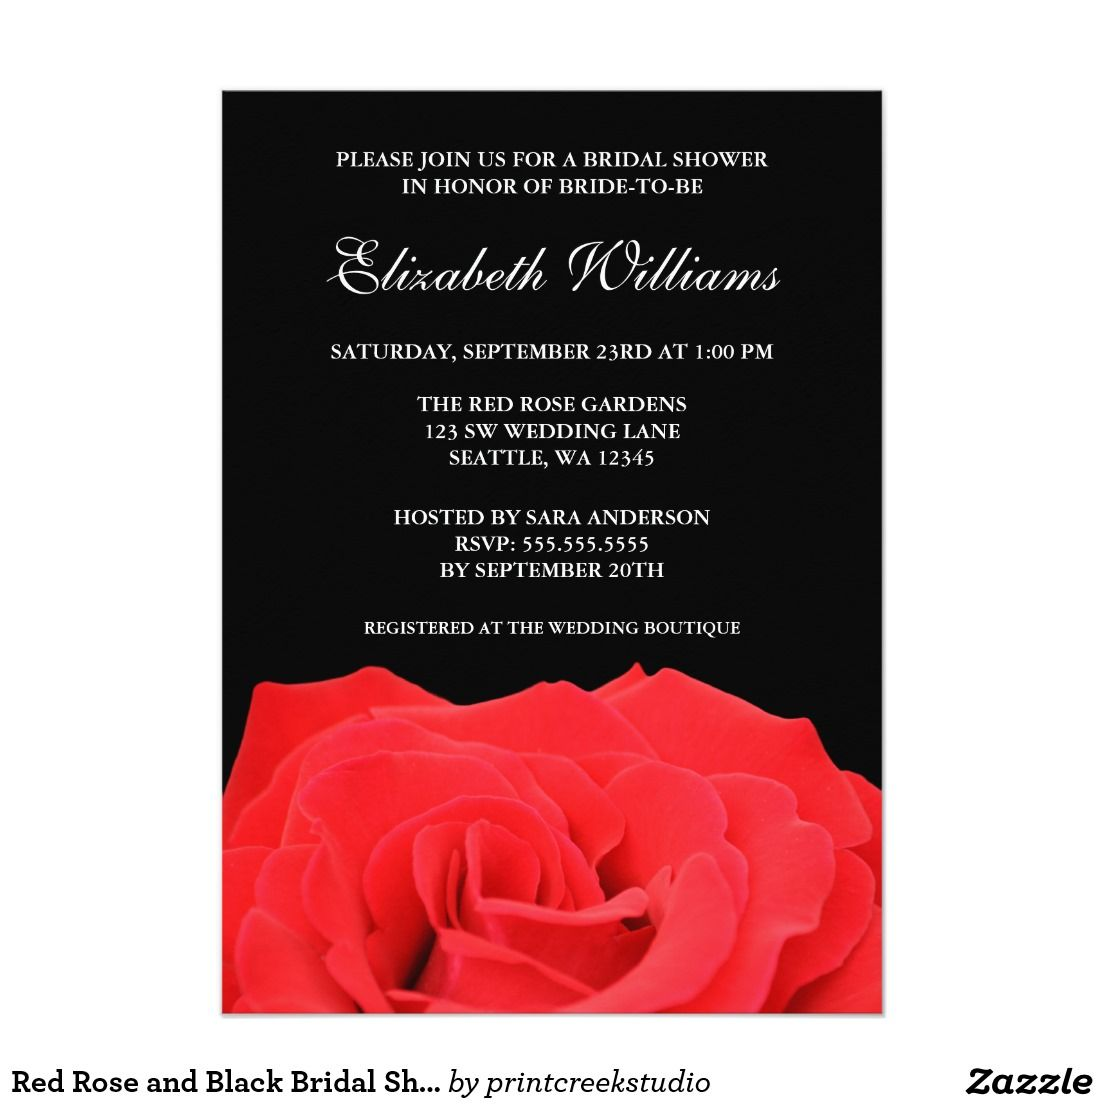 Red Rose and Black Bridal Shower Invitation | Pinterest | Bridal ...